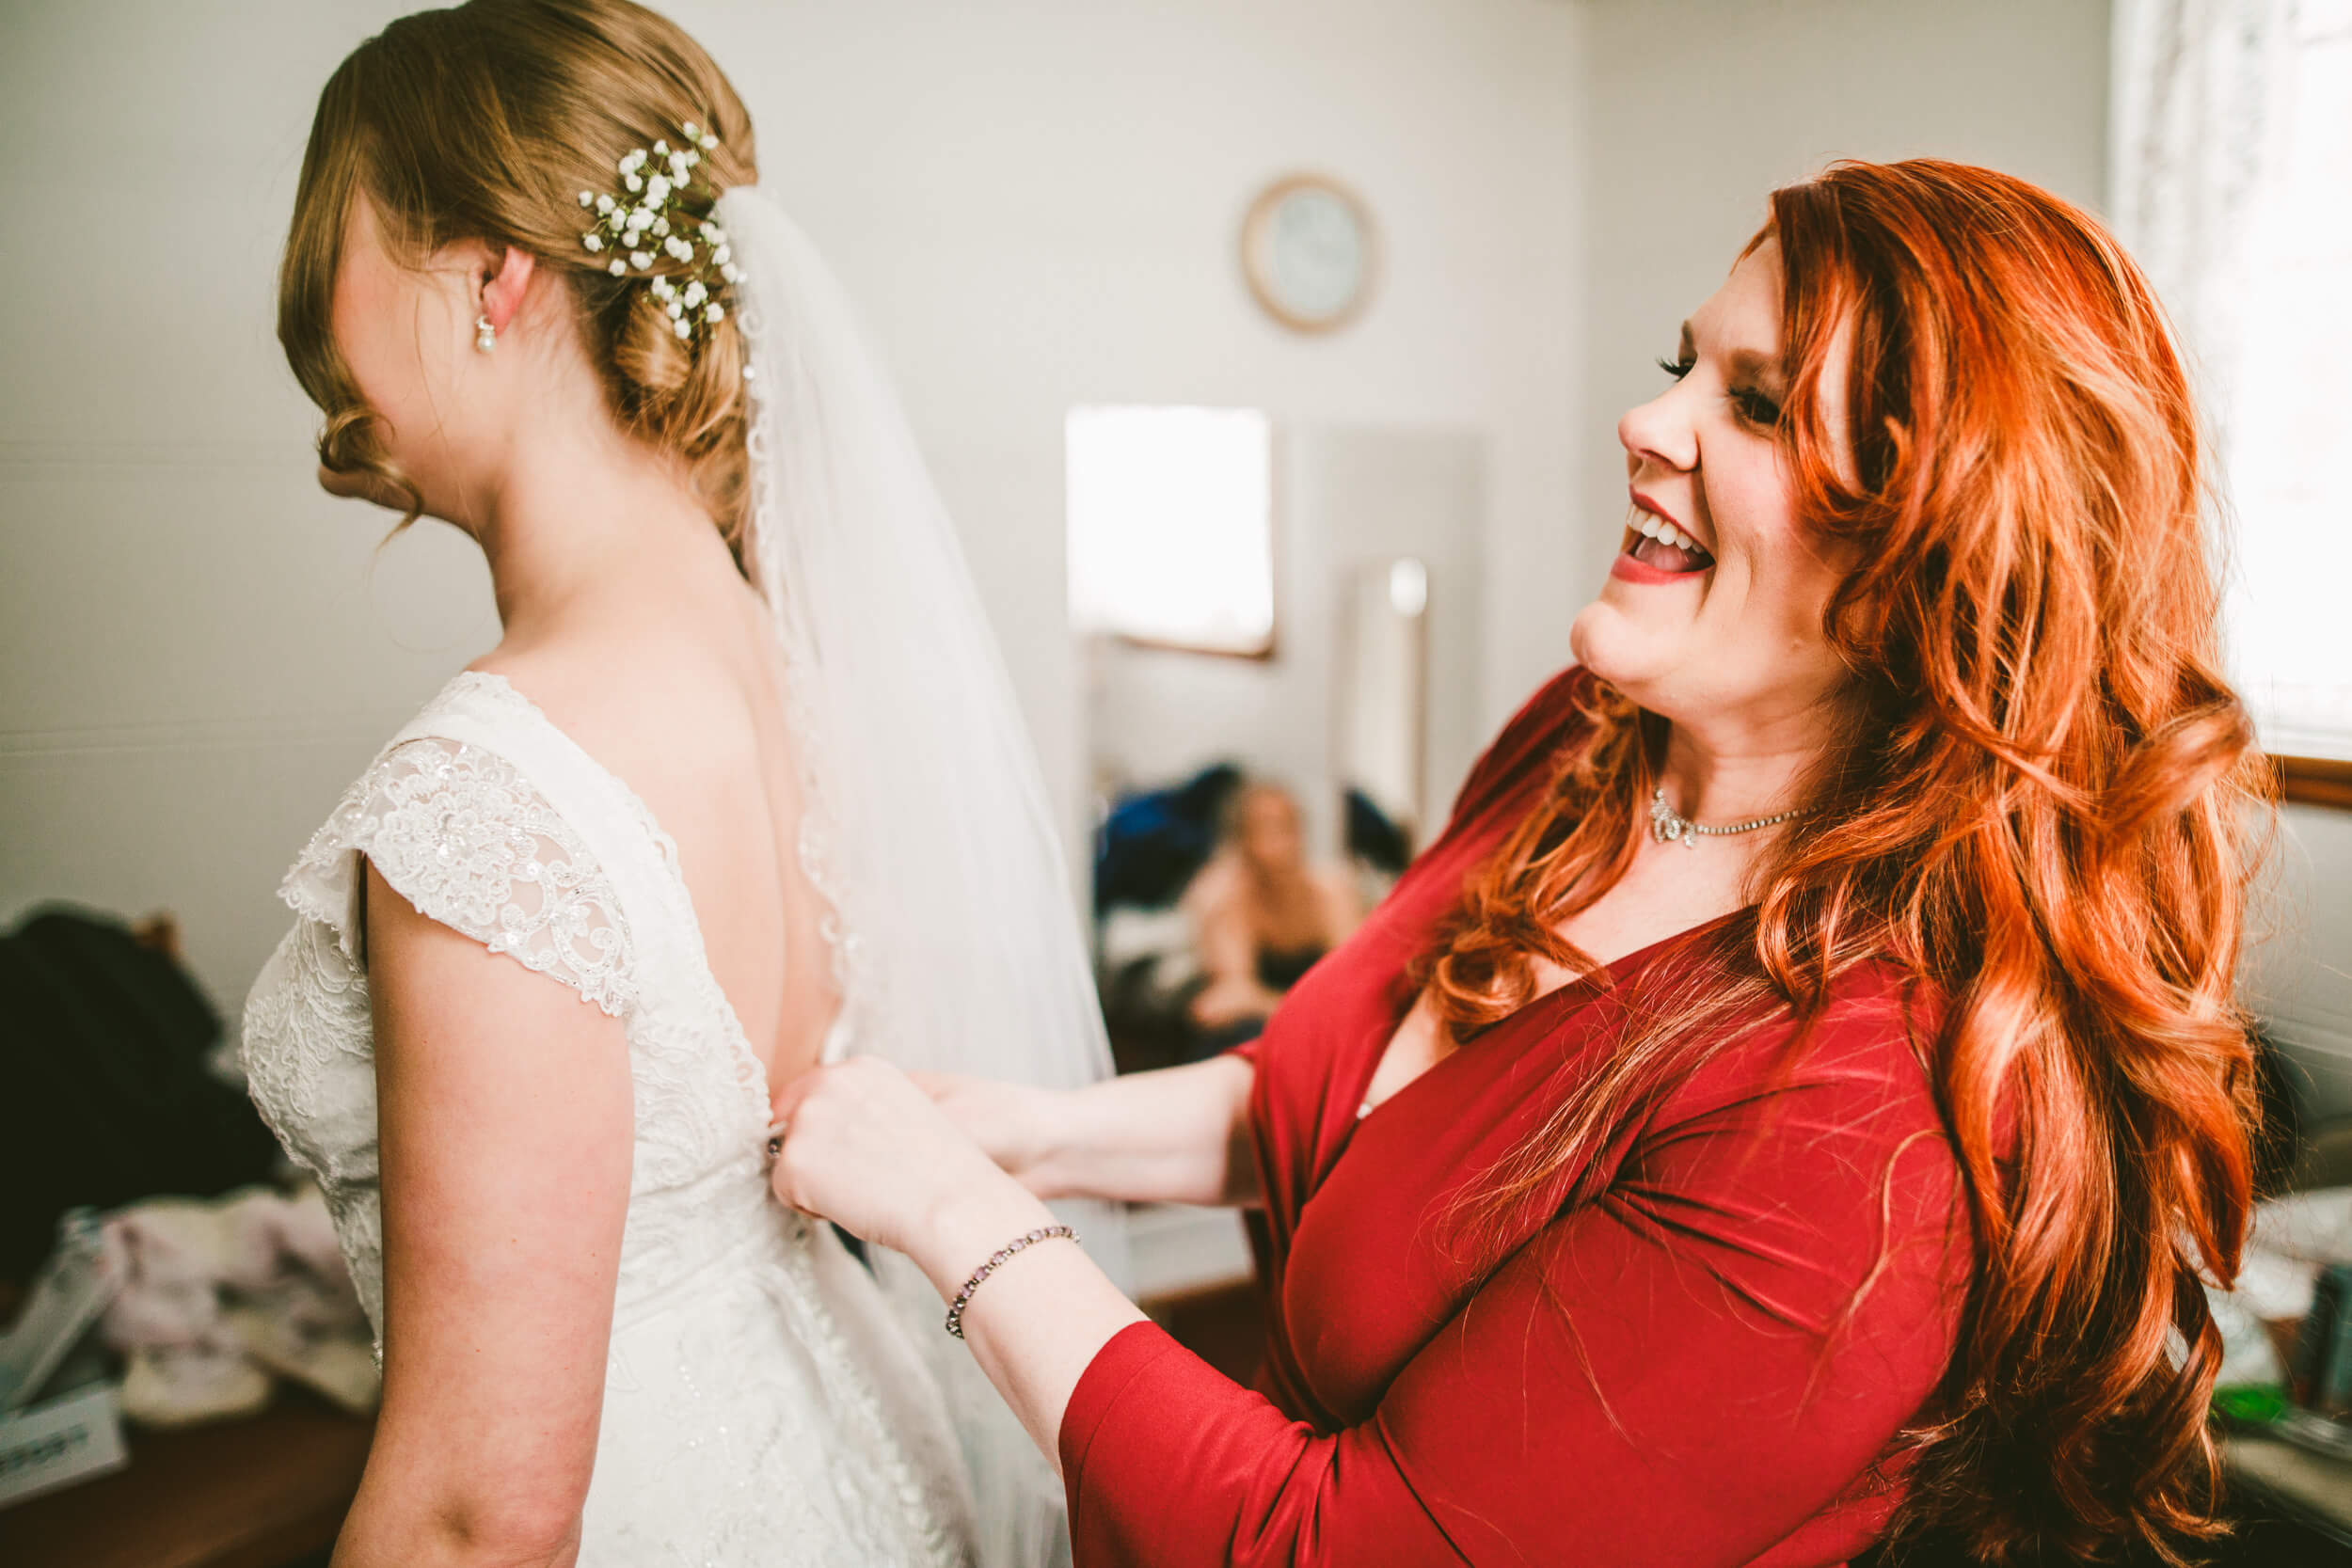 mukogawa winter wedding in spokane (43).jpg